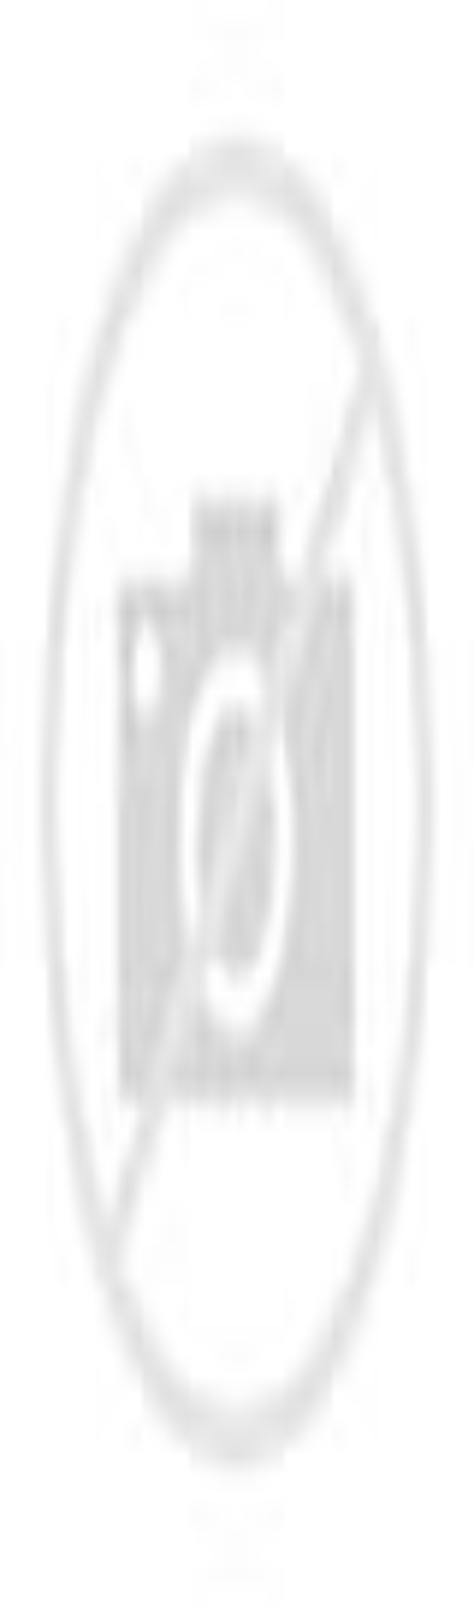 dj press kit template free musician dj press kit resume indesign template by